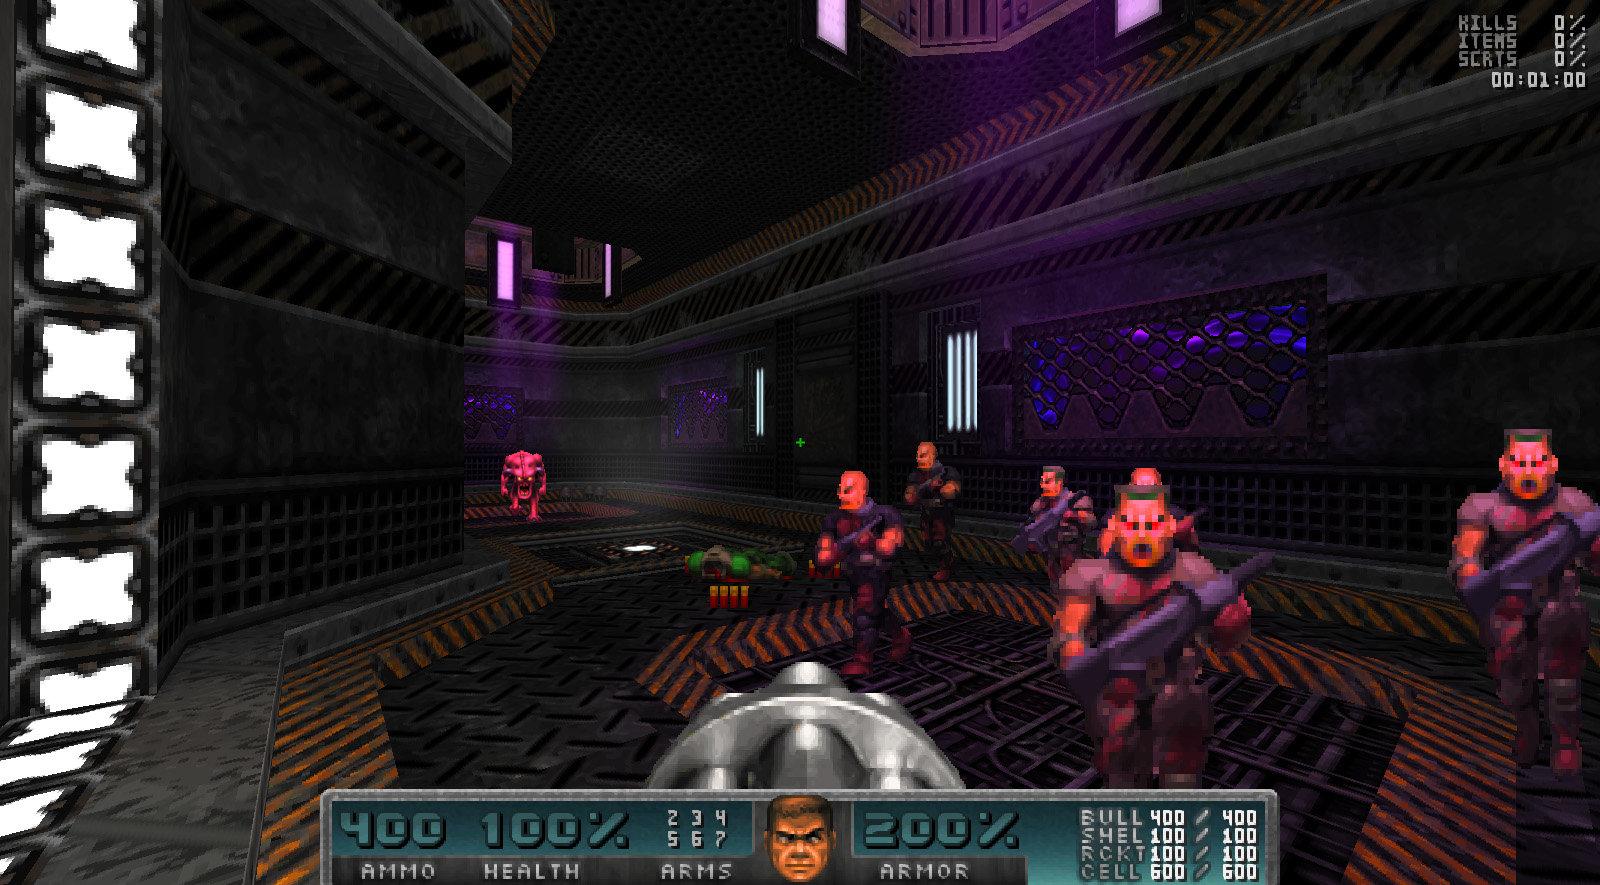 Screenshot_Doom_20200515_221849.jpg.bcd7e1379f591bec3a284d648e8692b6.jpg